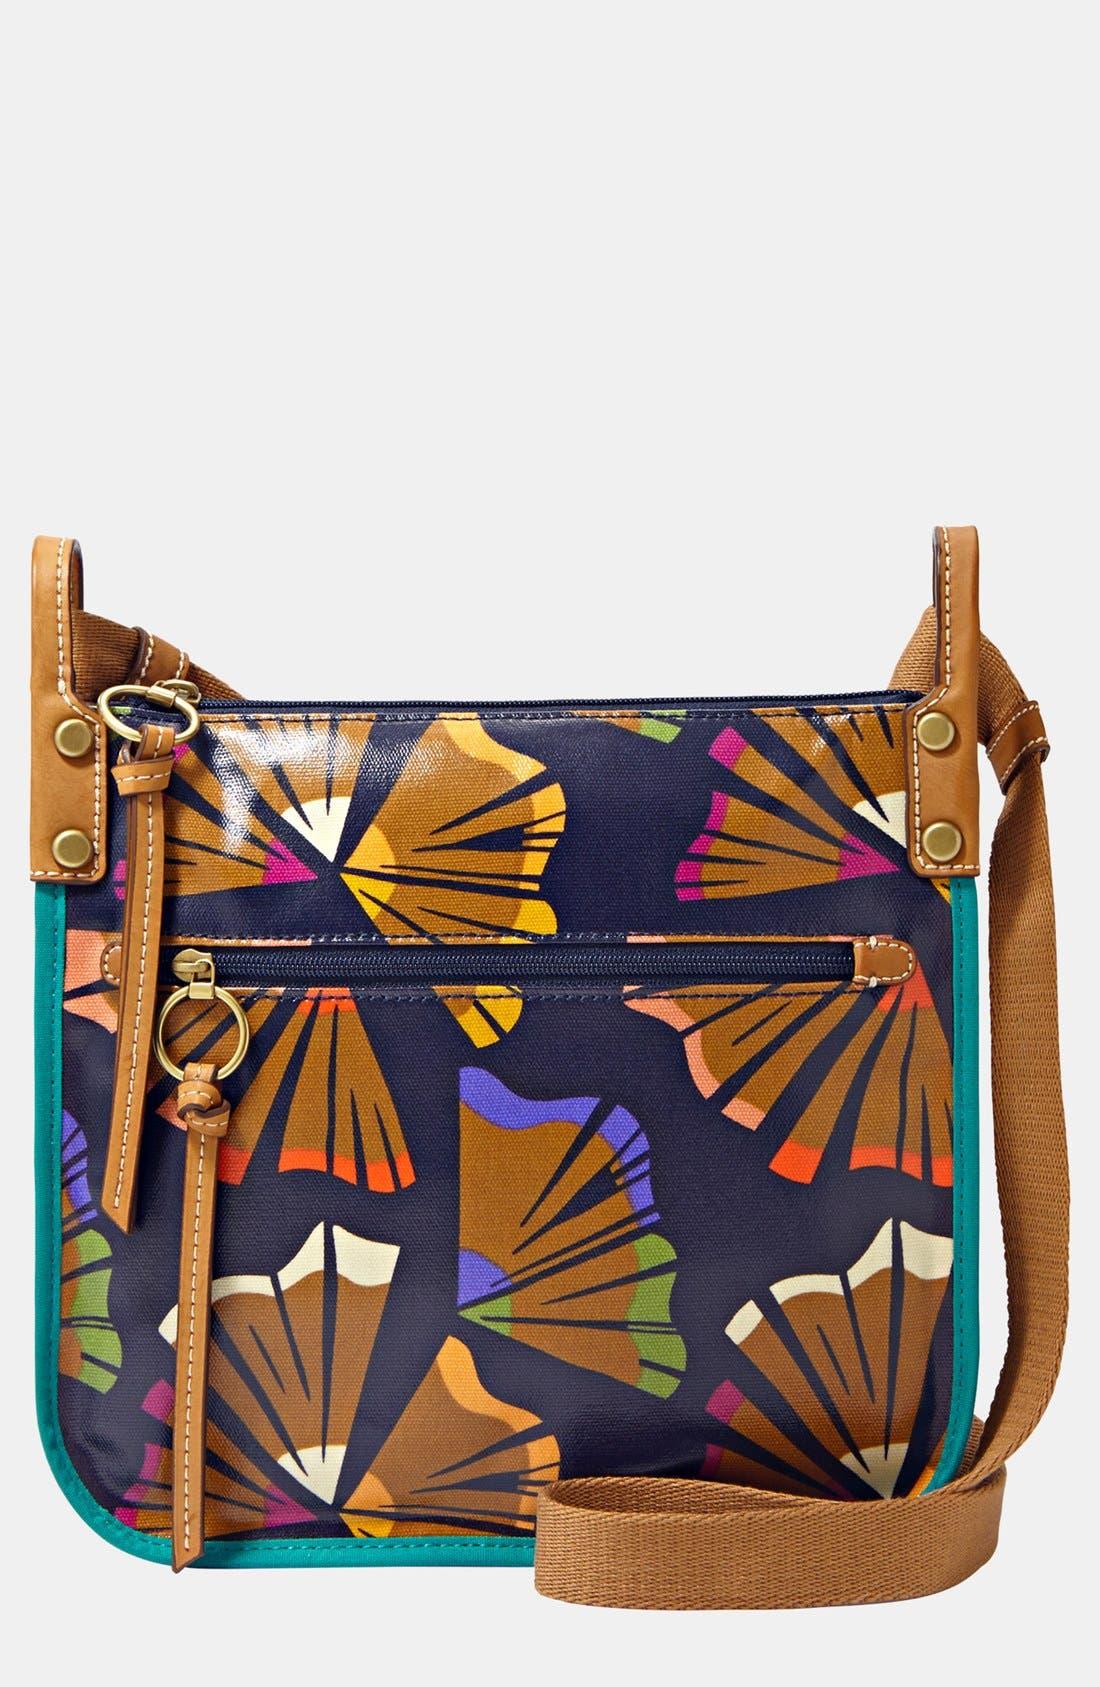 Alternate Image 1 Selected - Fossil 'Key-Per' Crossbody Bag